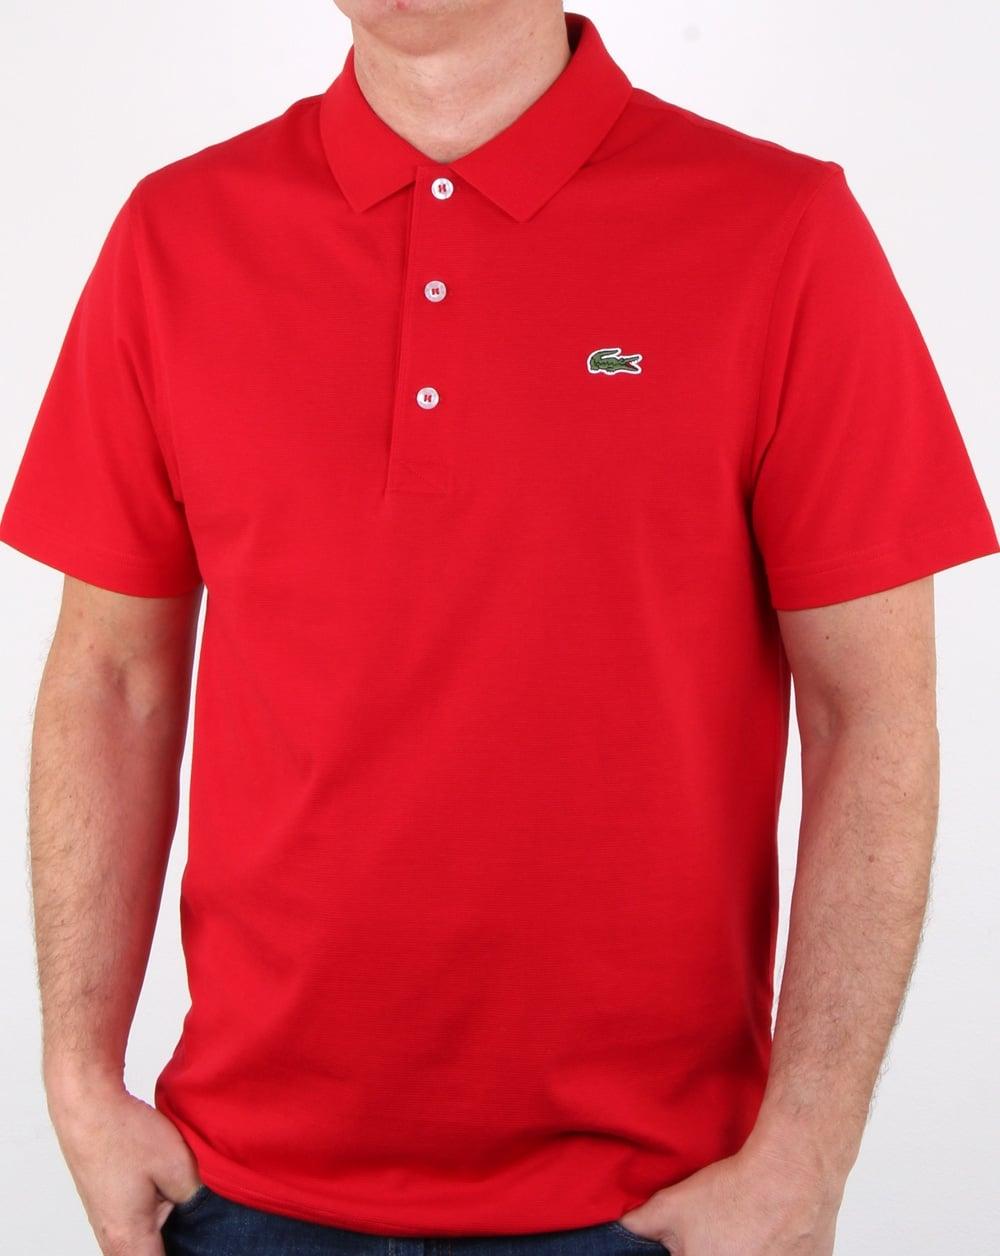 3a7a7e3953 Lacoste Polo Shirt Red